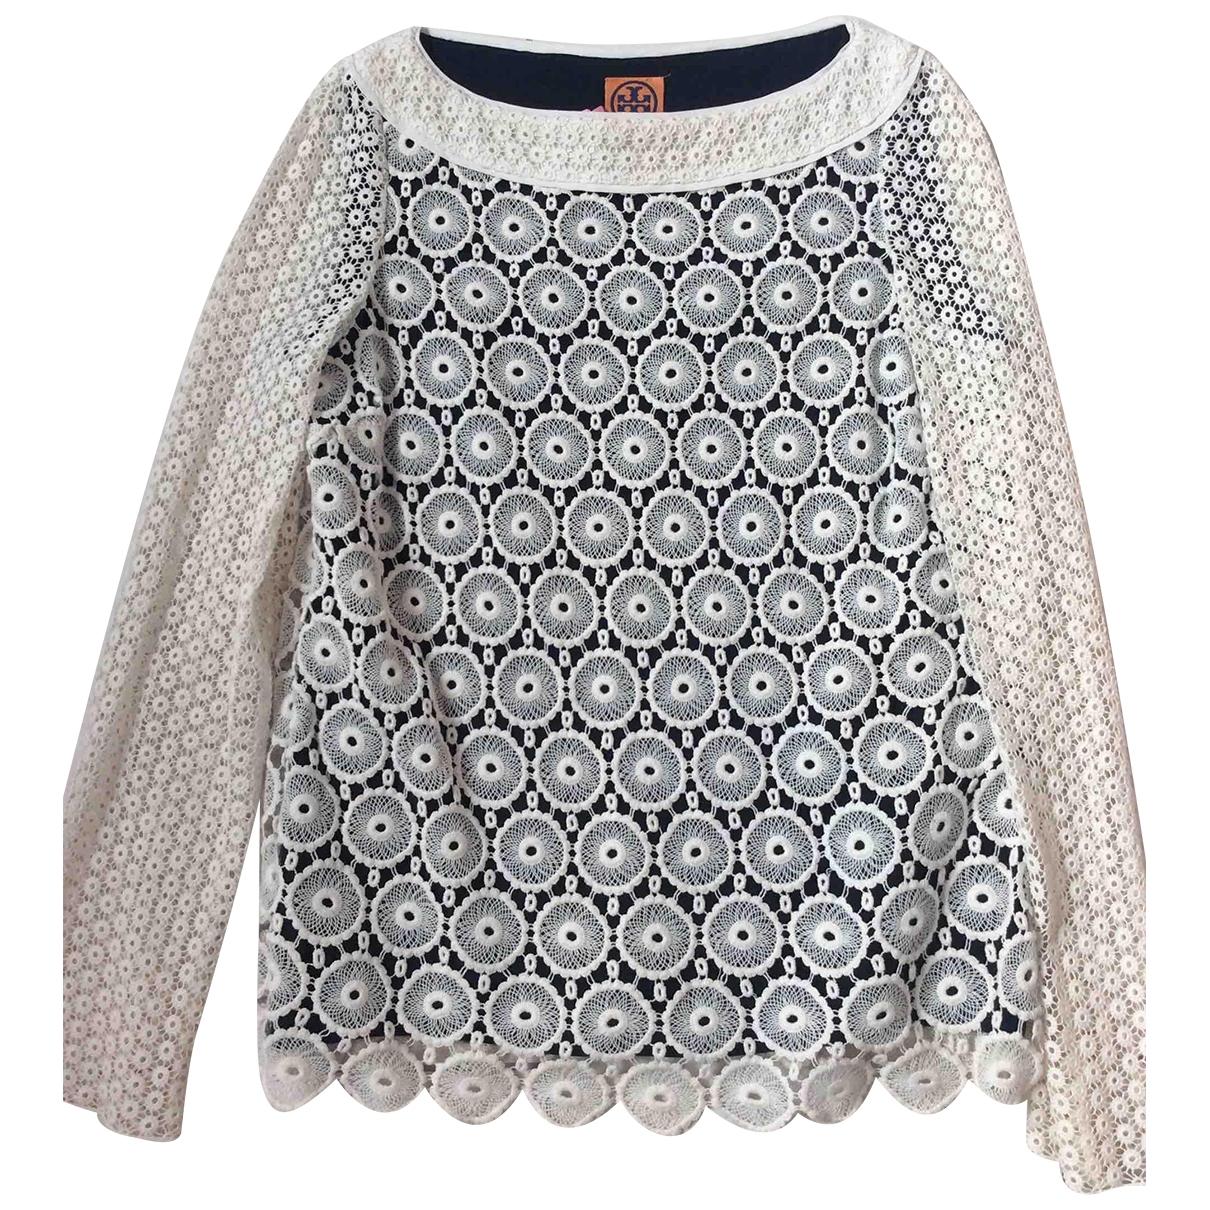 Tory Burch \N White Cotton Knitwear for Women 6 US